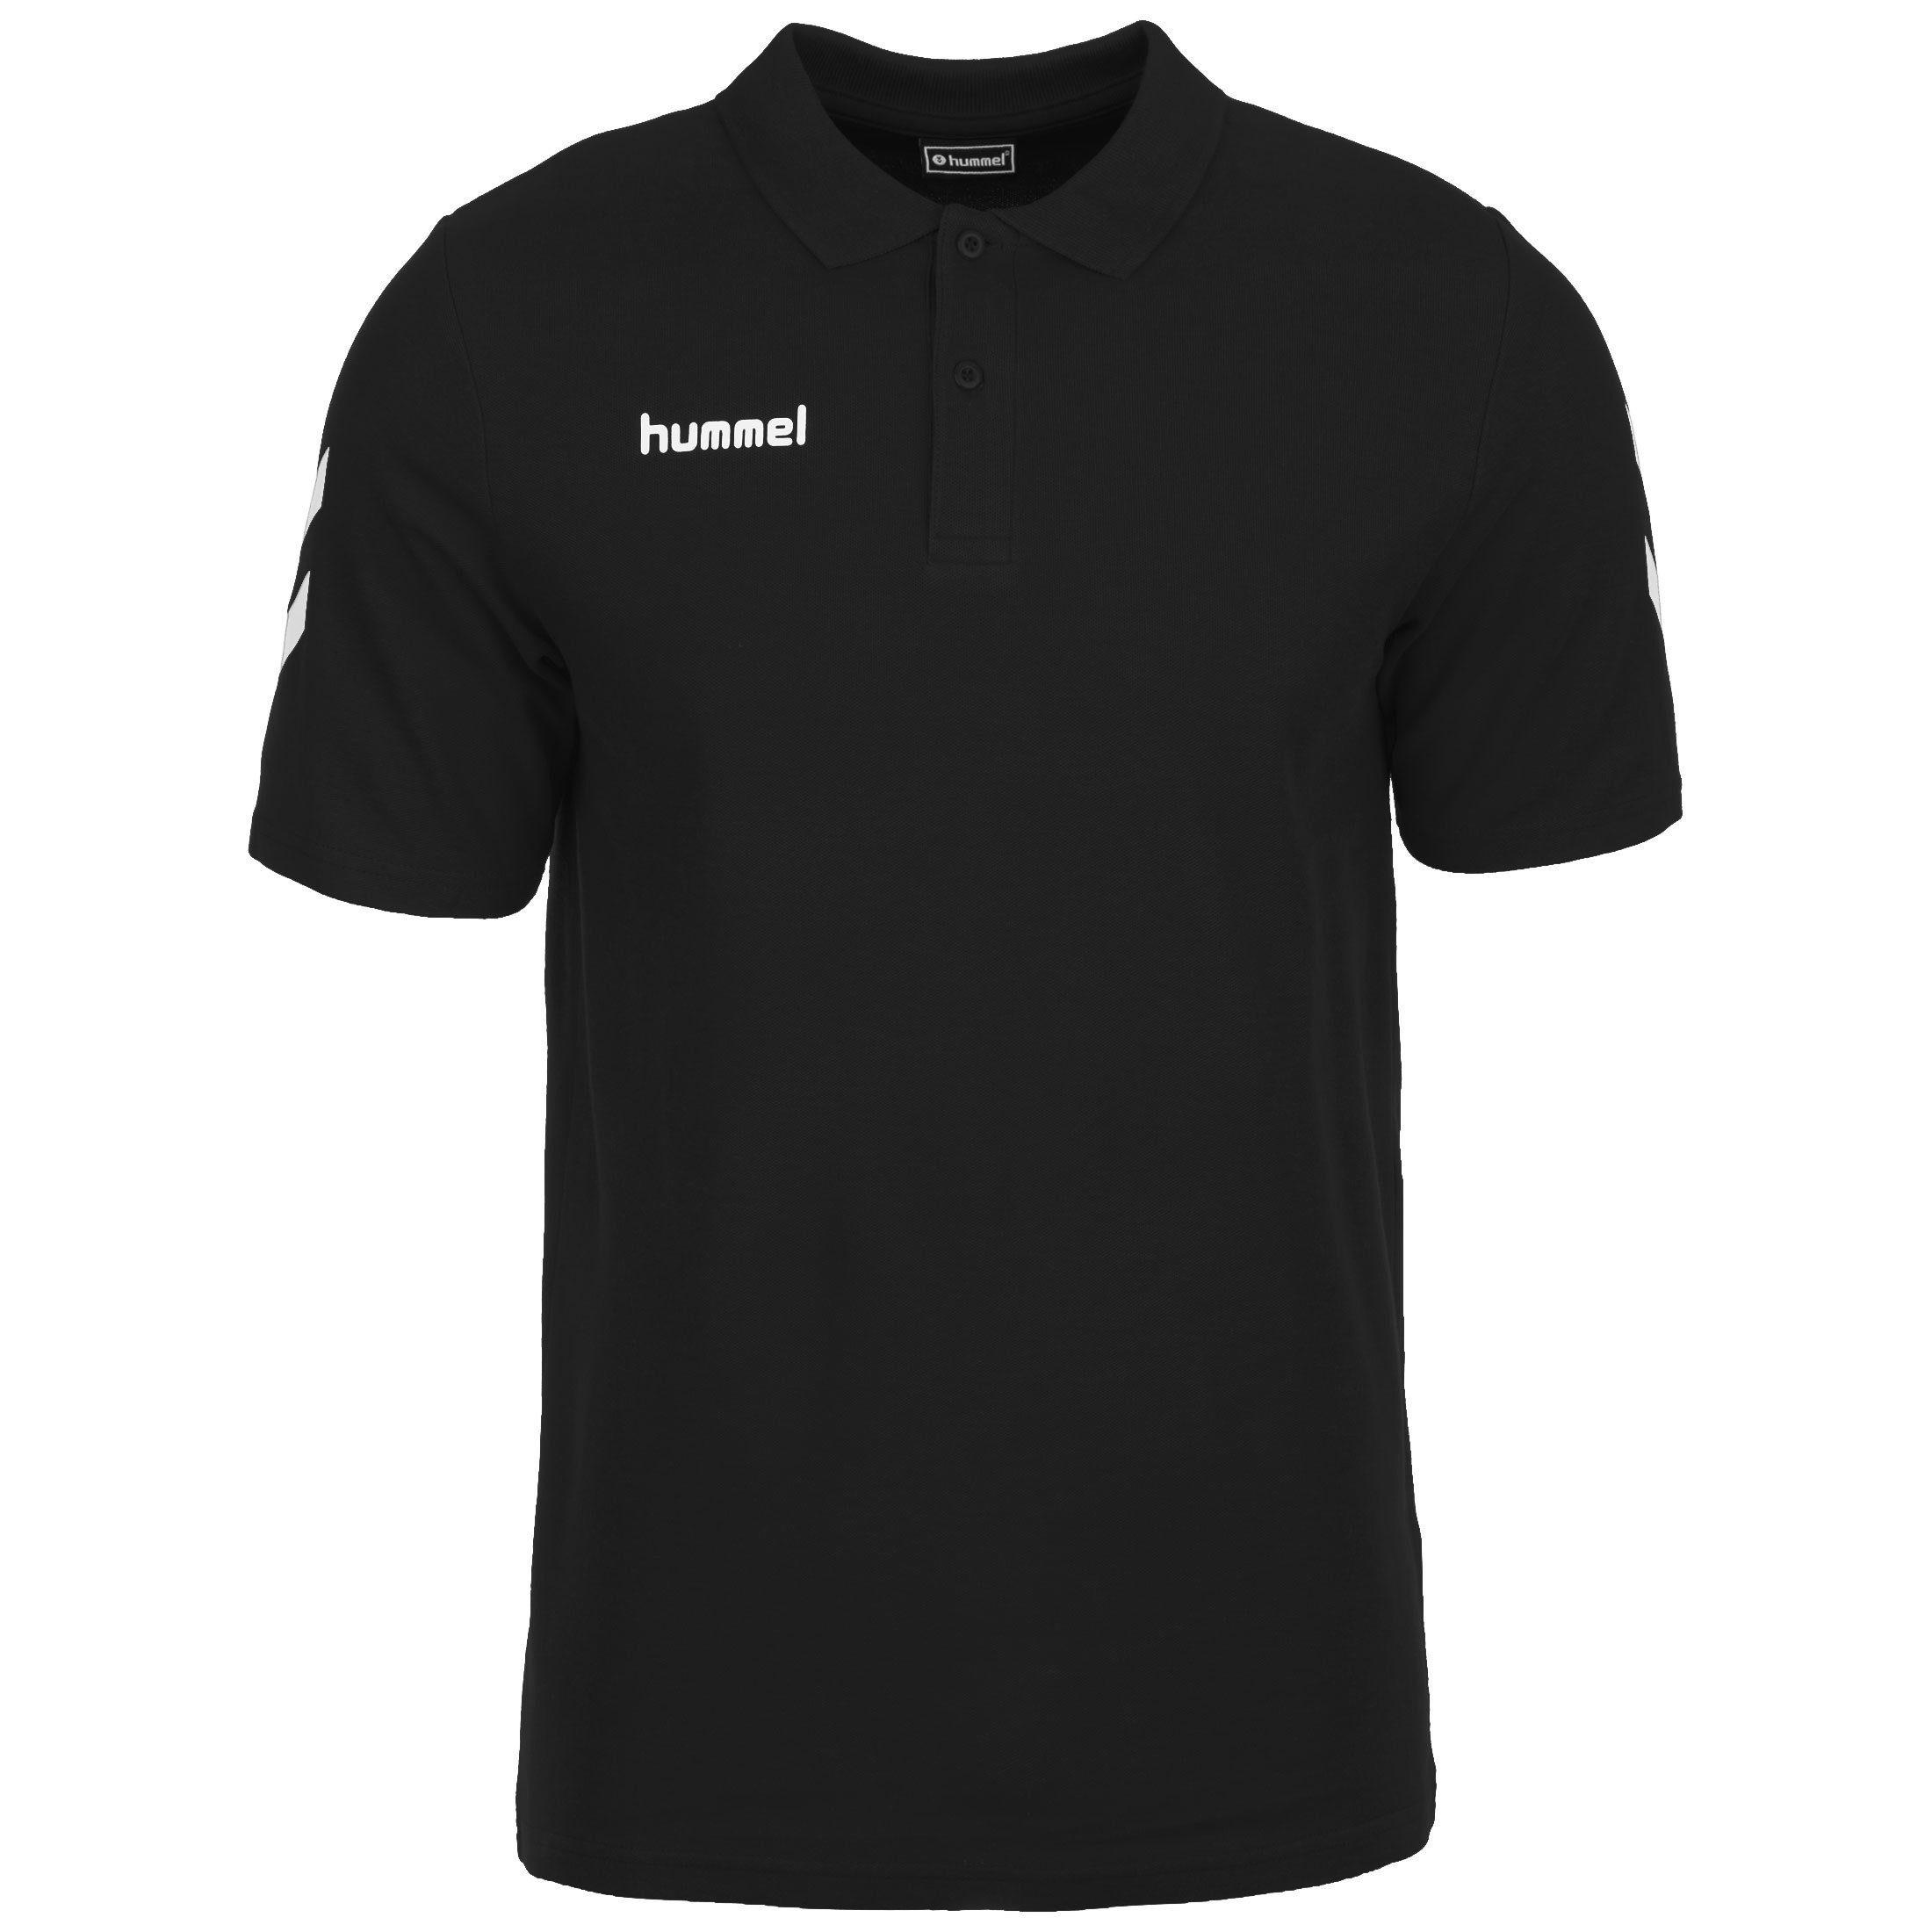 hummel Poloshirt Hmlgo   Bekleidung > Polo Shirts > Kurzarm   Schwarz   Hummel